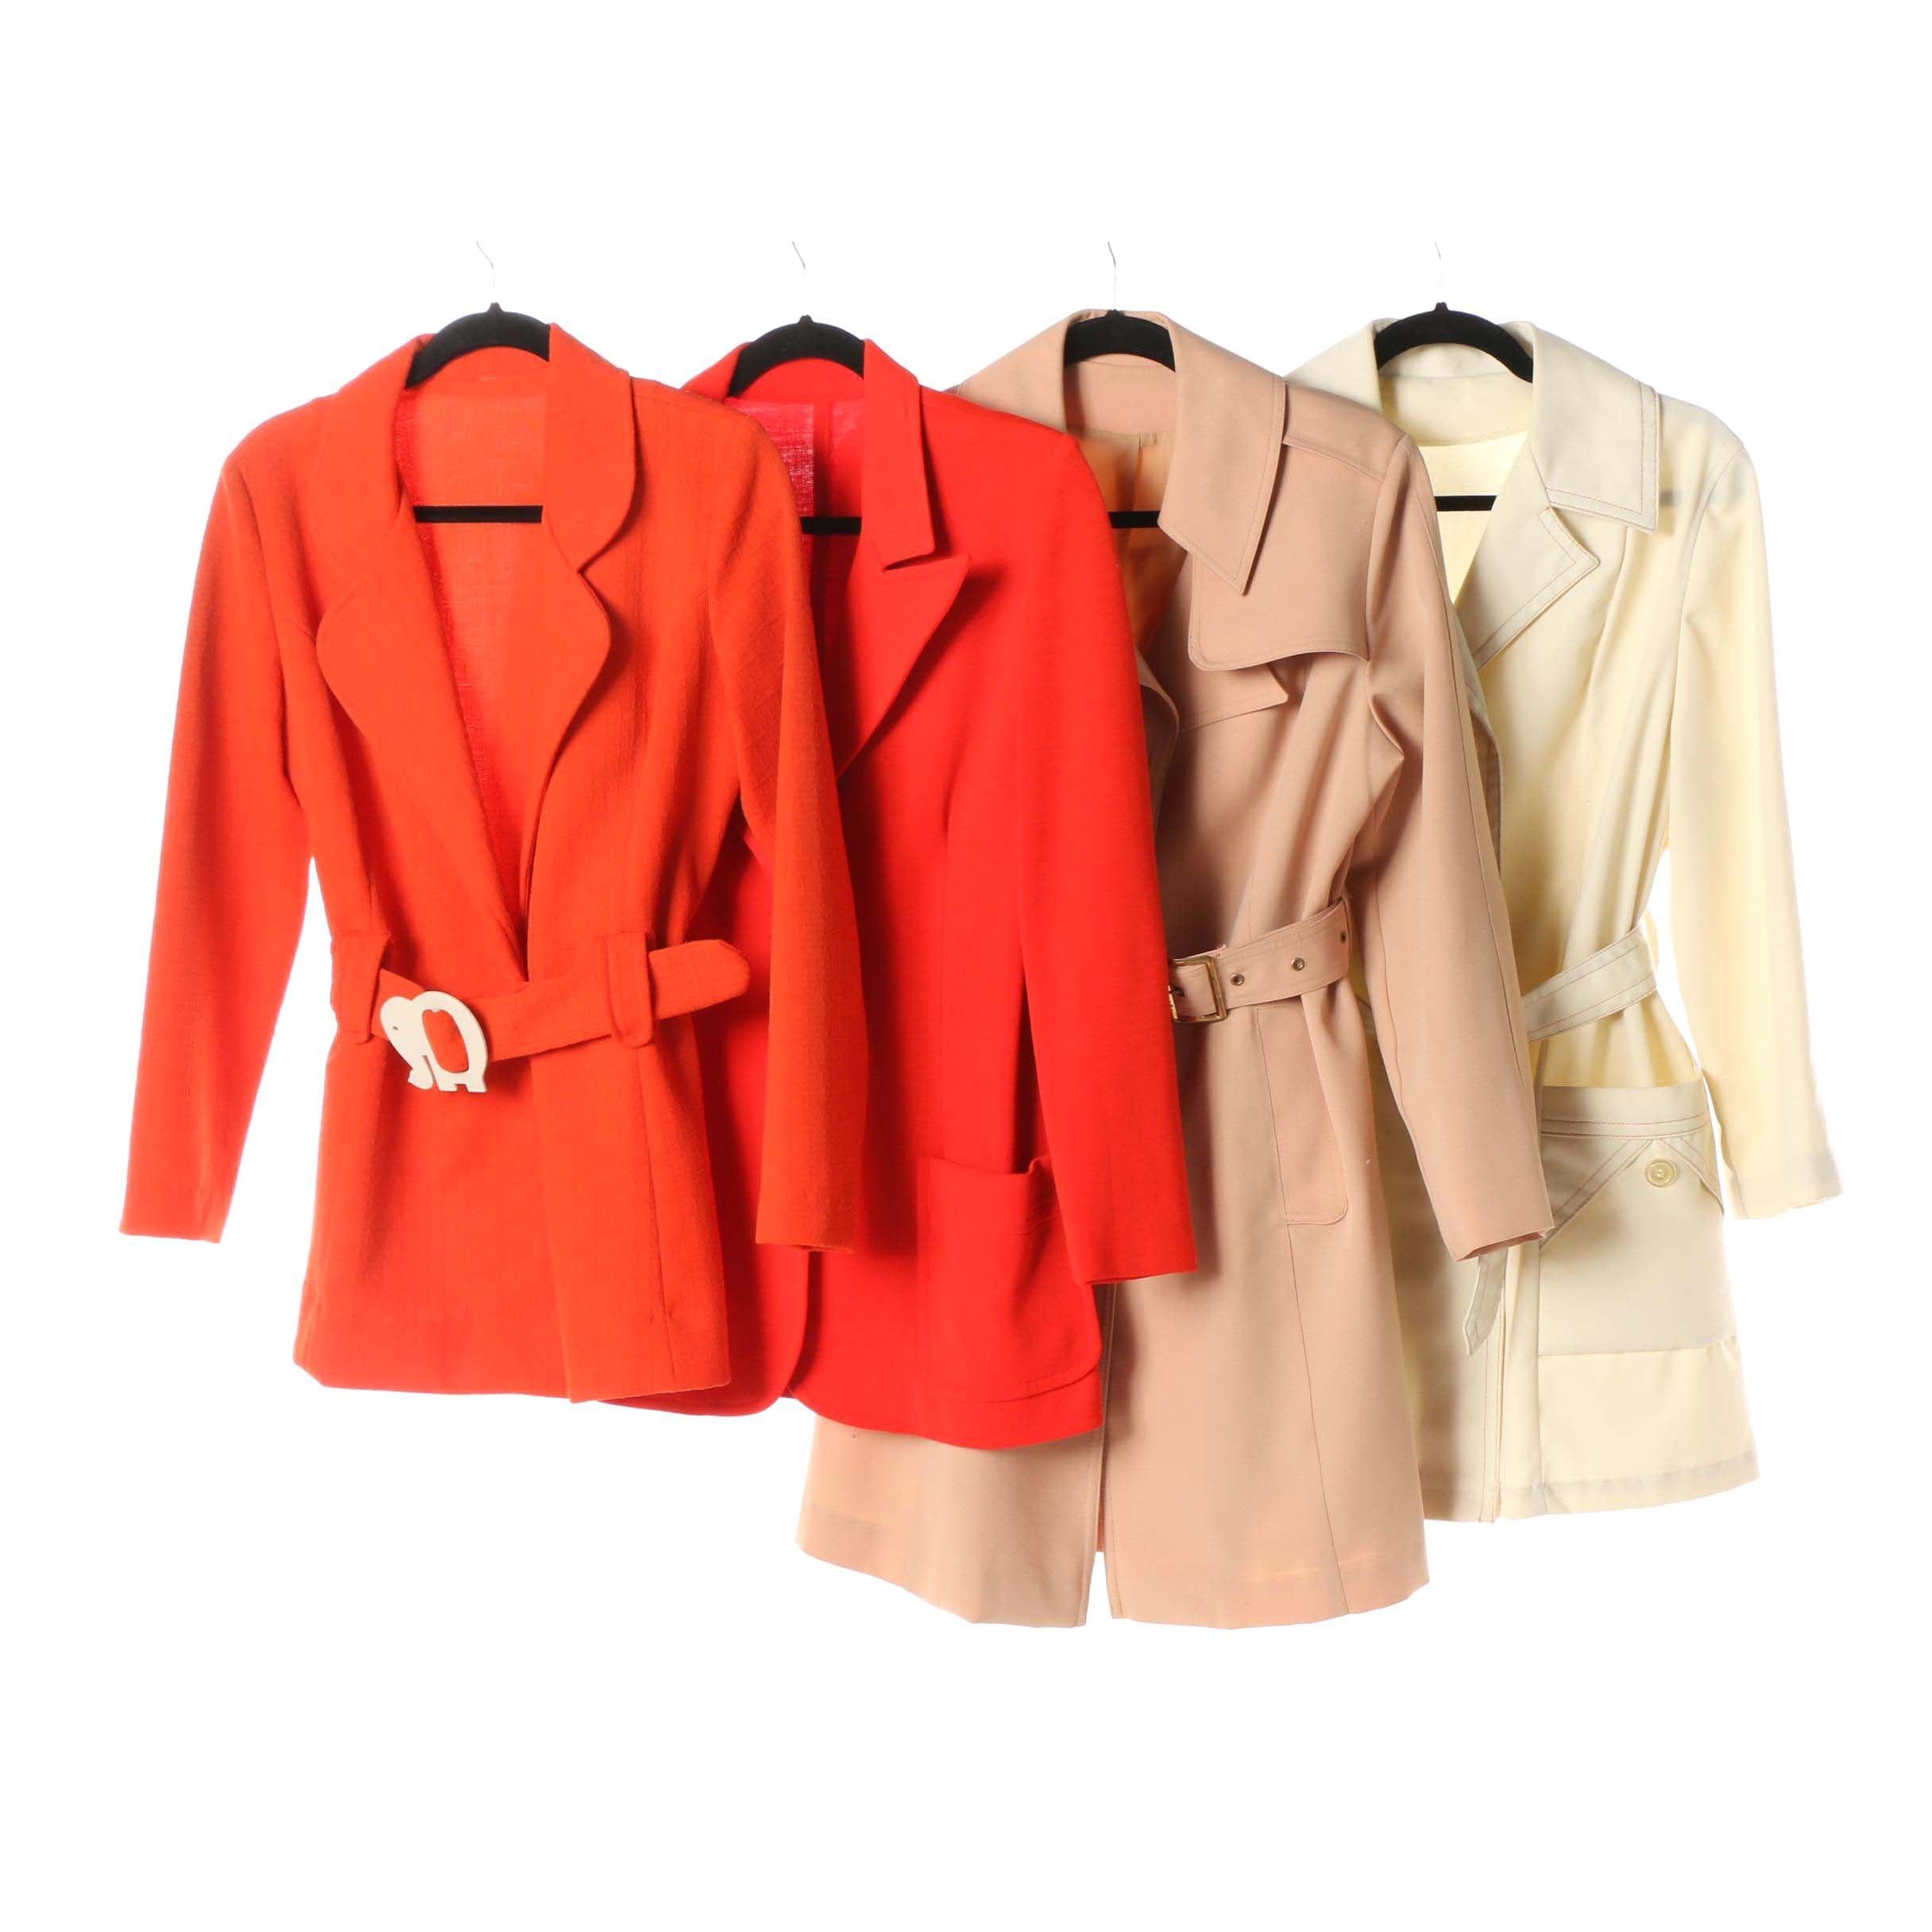 Women's Circa 1970 Vintage Jackets including Pier 4 by Davis of Boston